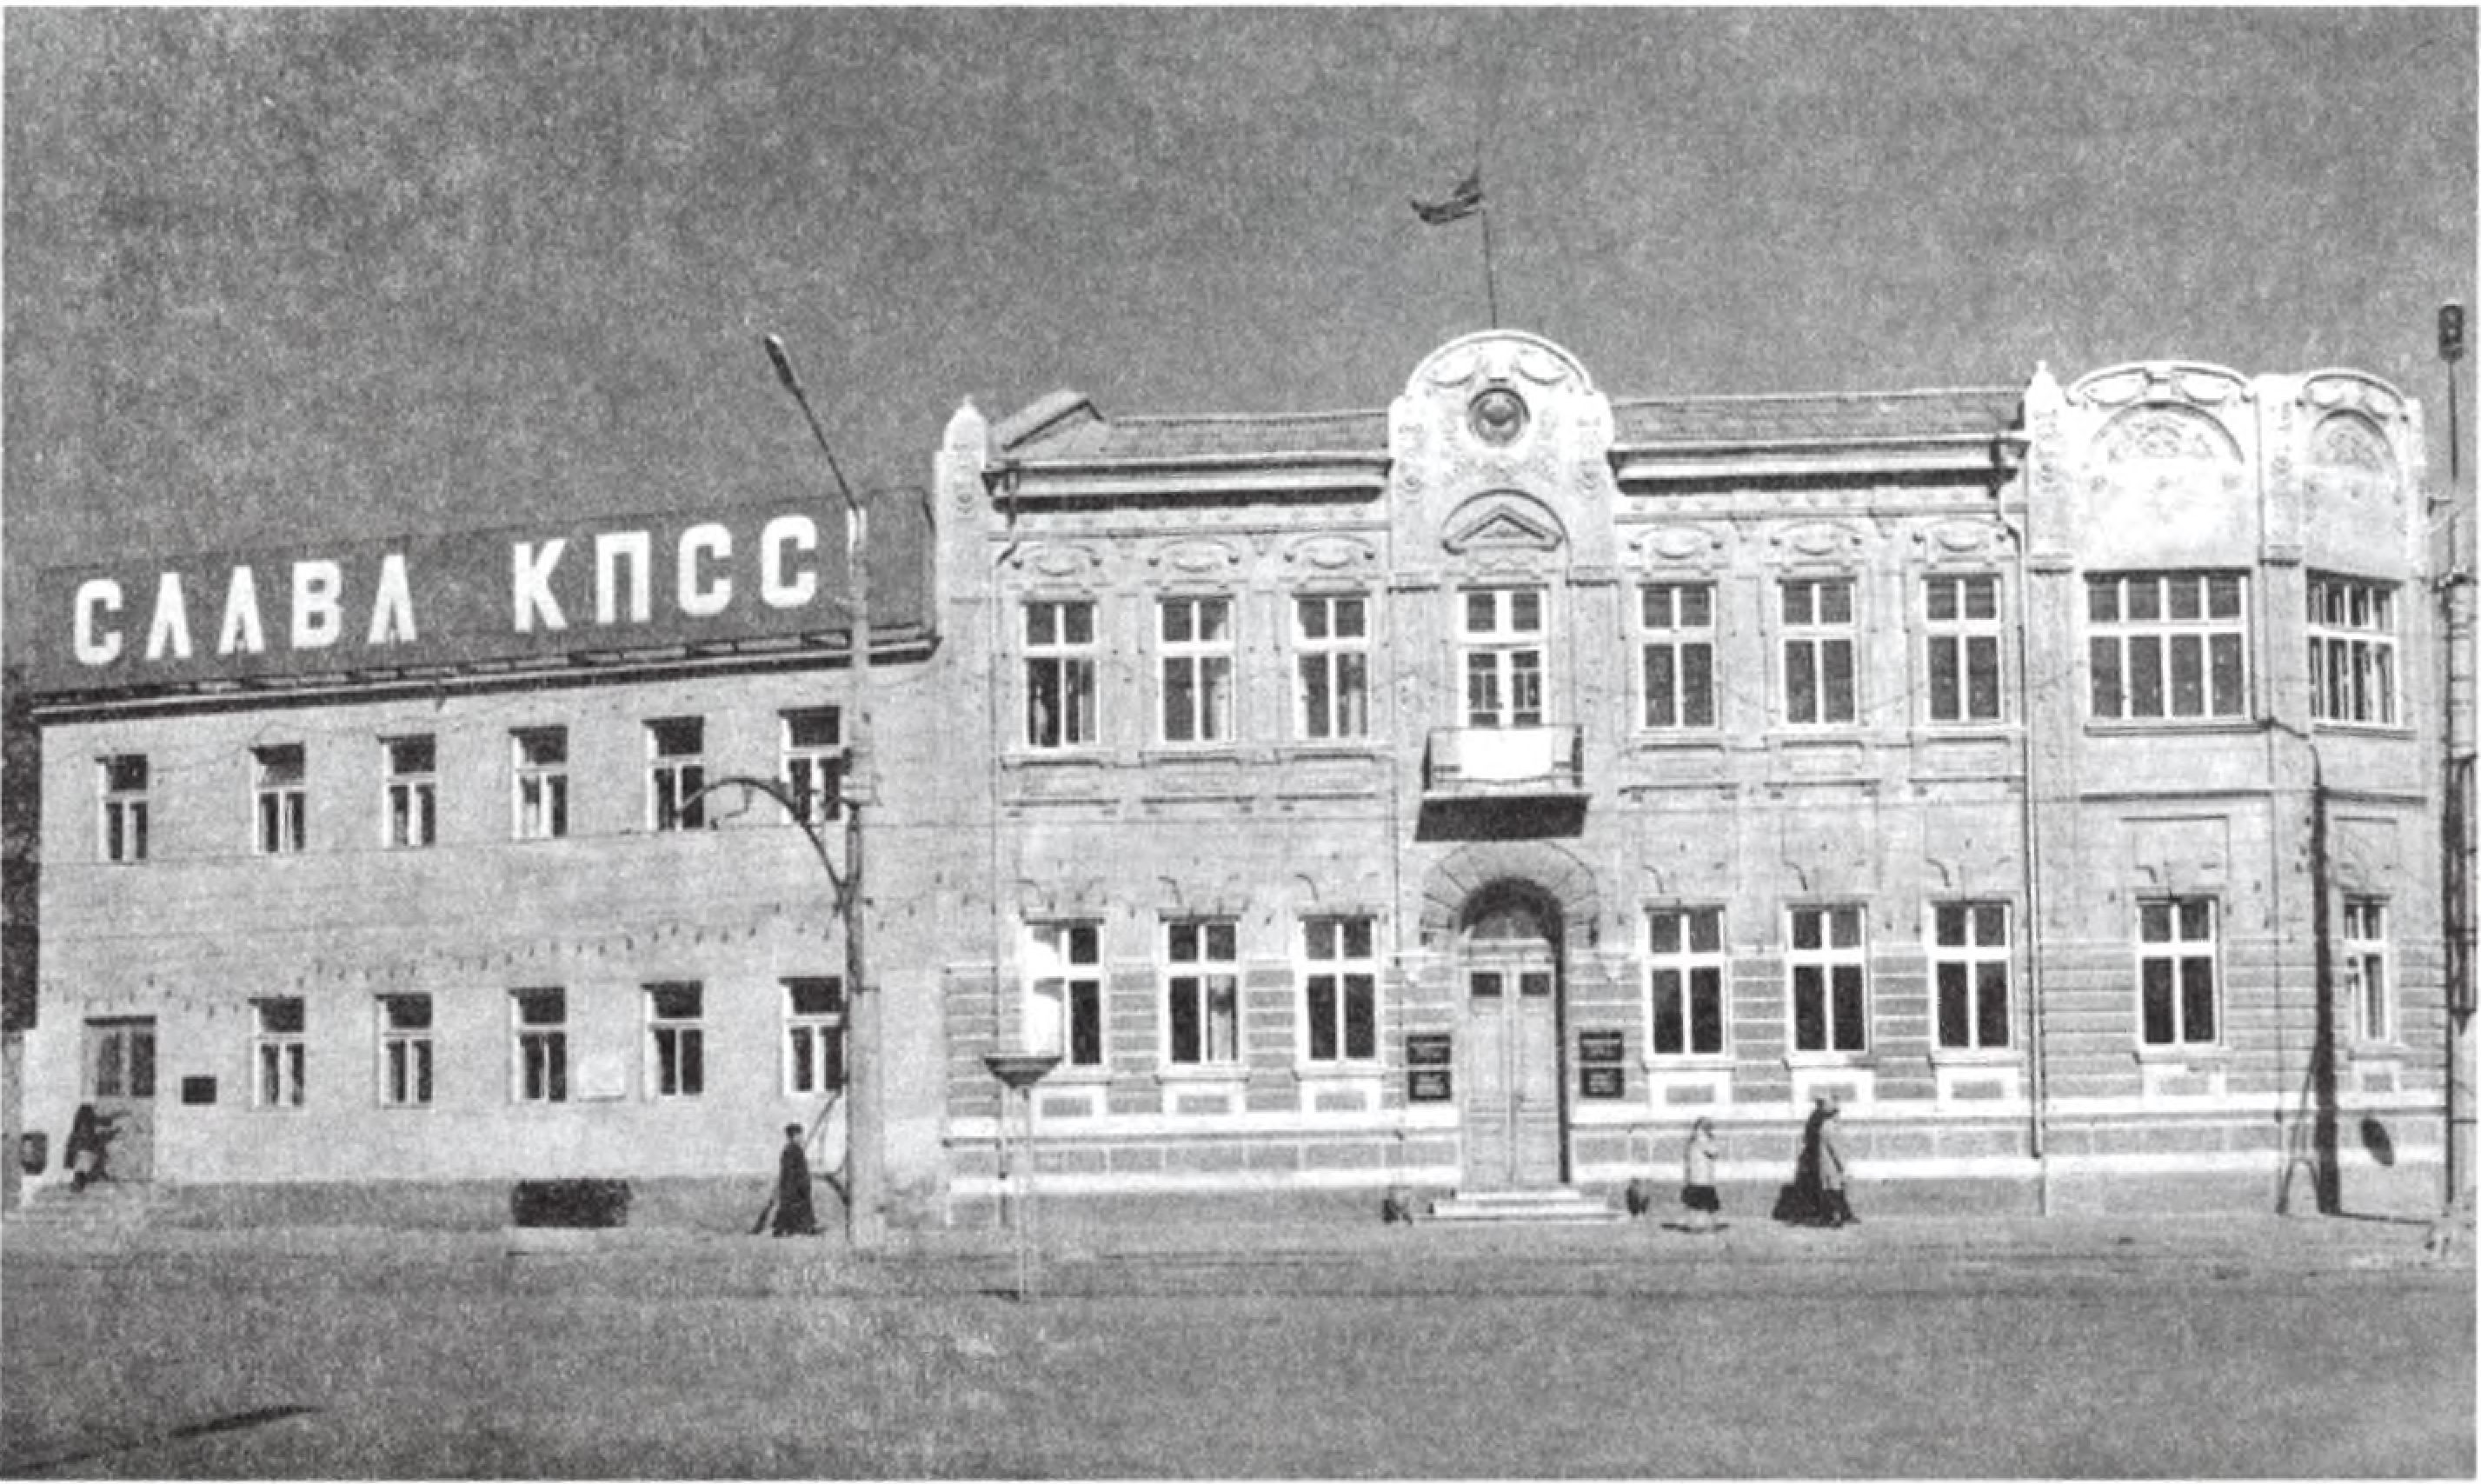 Дом Ф.Х. Овчинникова. Архитектор А.Л. Генрих. 1908 г.